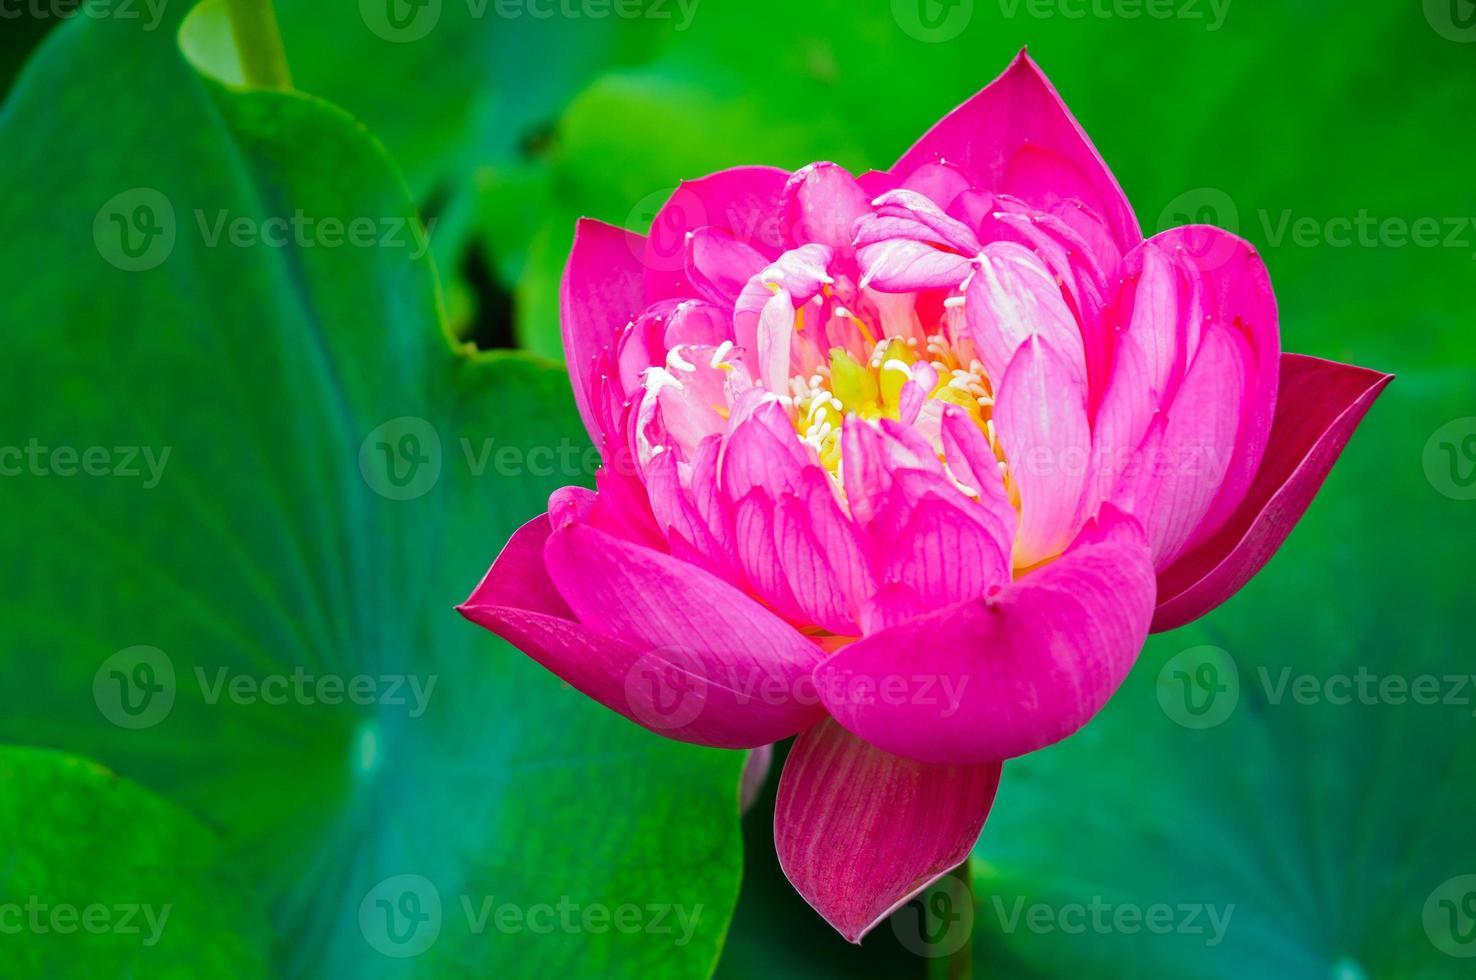 hermosas flores de loto rosa foto